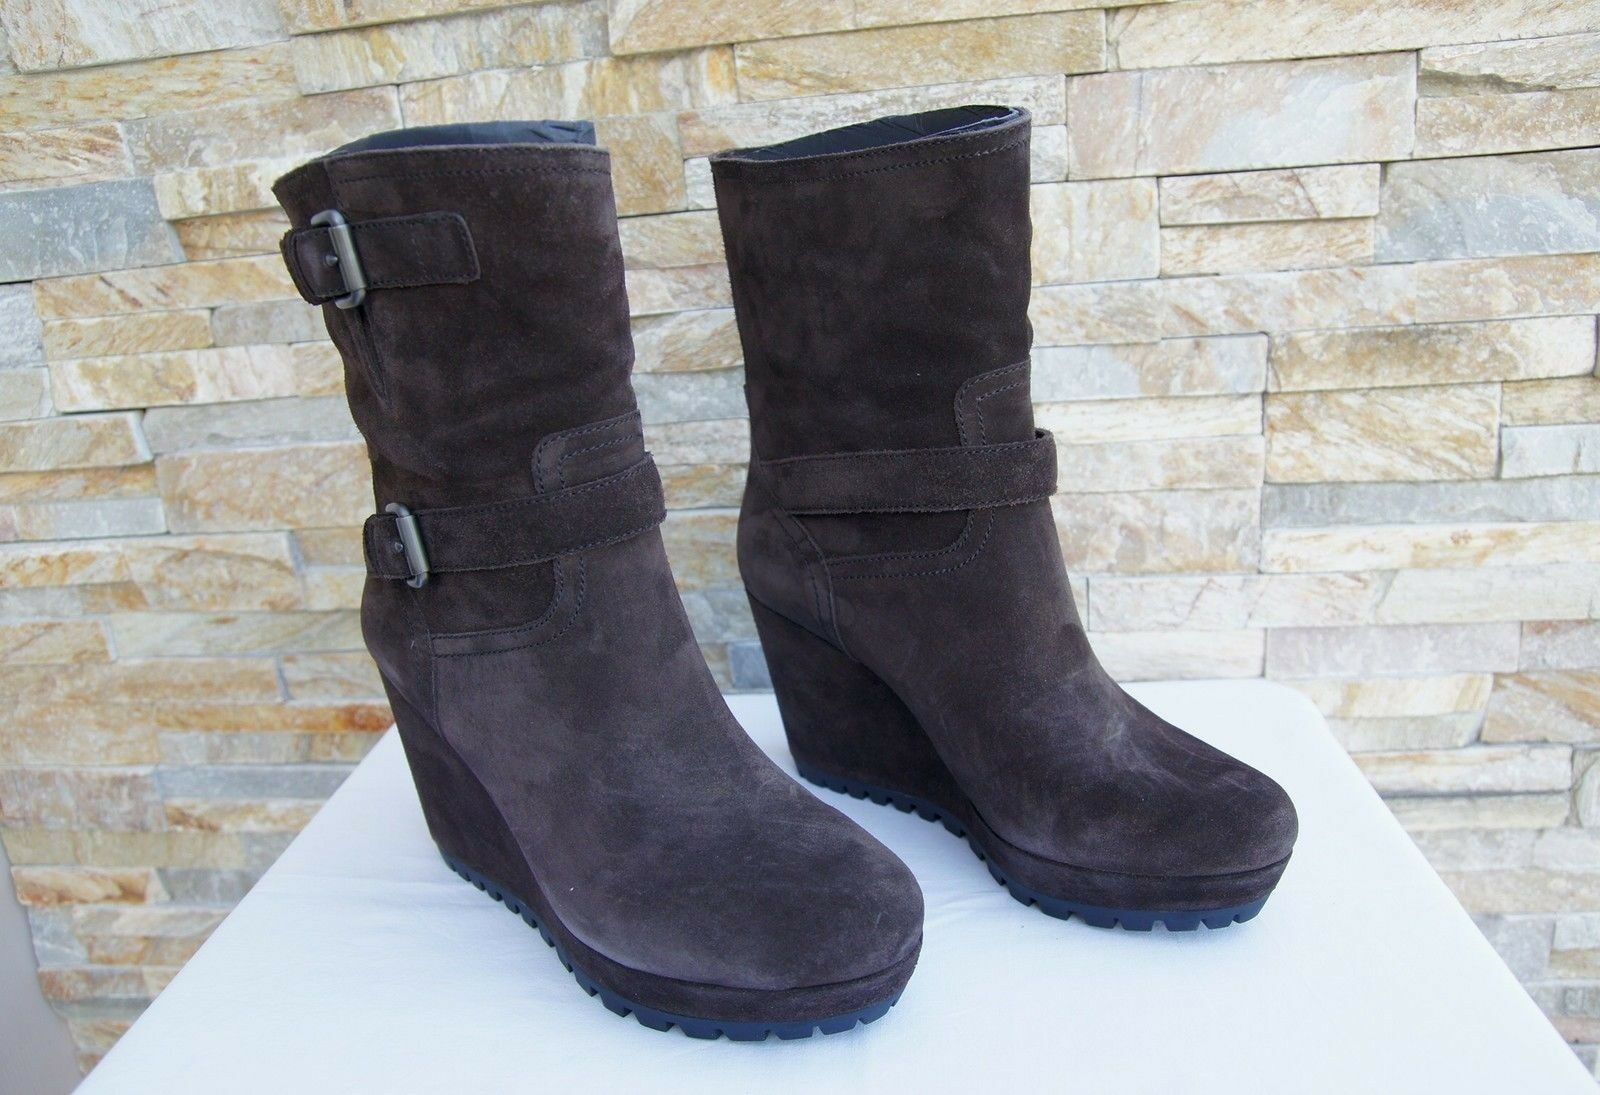 PRADA Gr 40 Keil Plateau Stiefeletten Booties Stiefel Schuhe Schuhe Schuhe braun neu d4e85c